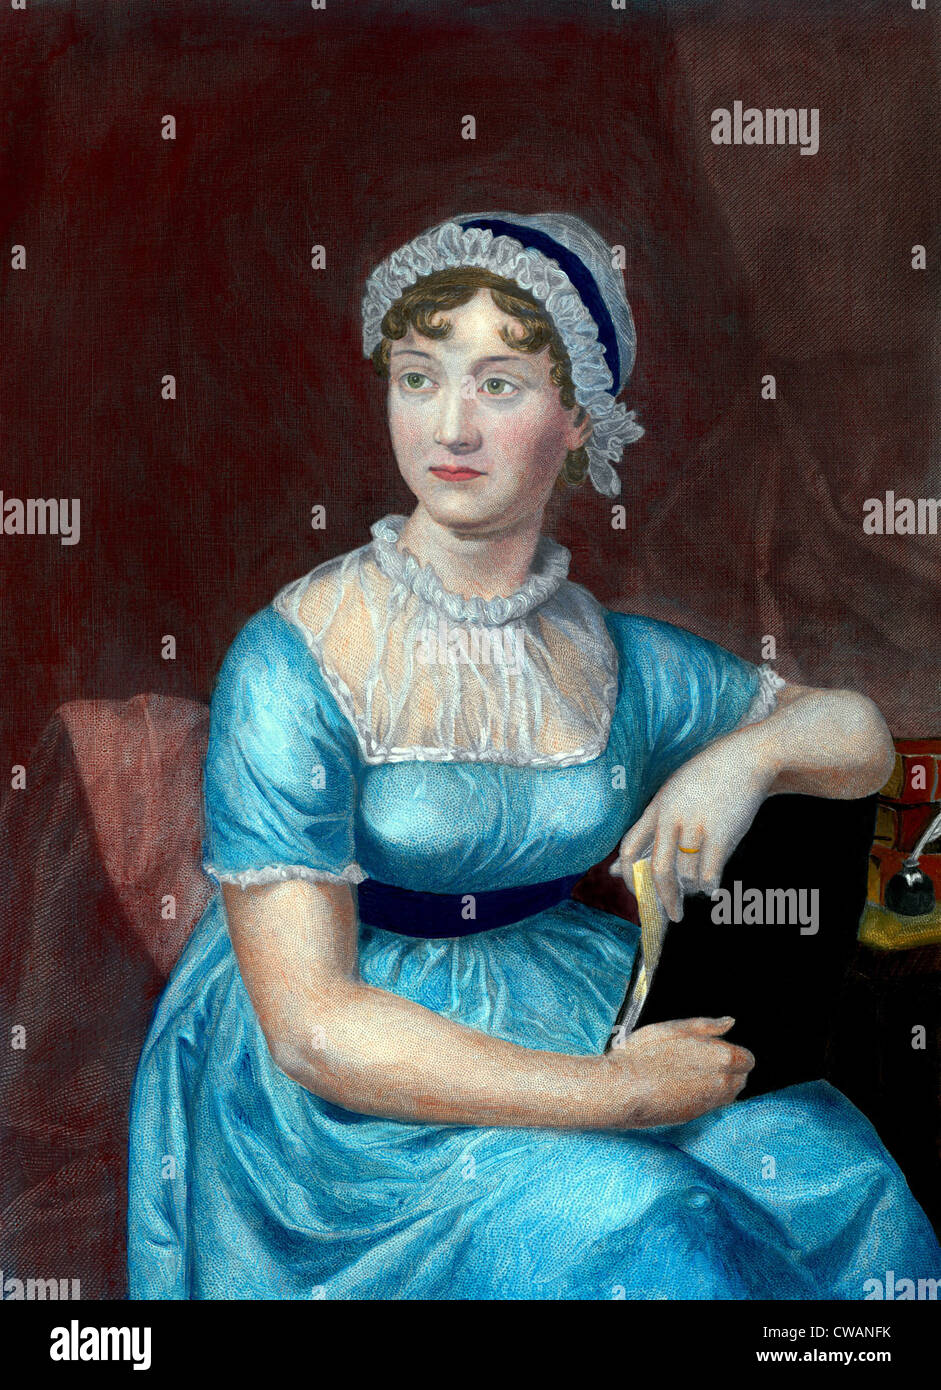 Jane Austen (1775-1817), novelista inglés, autor de la novela clásica perdurable sobre clase media la Imagen De Stock